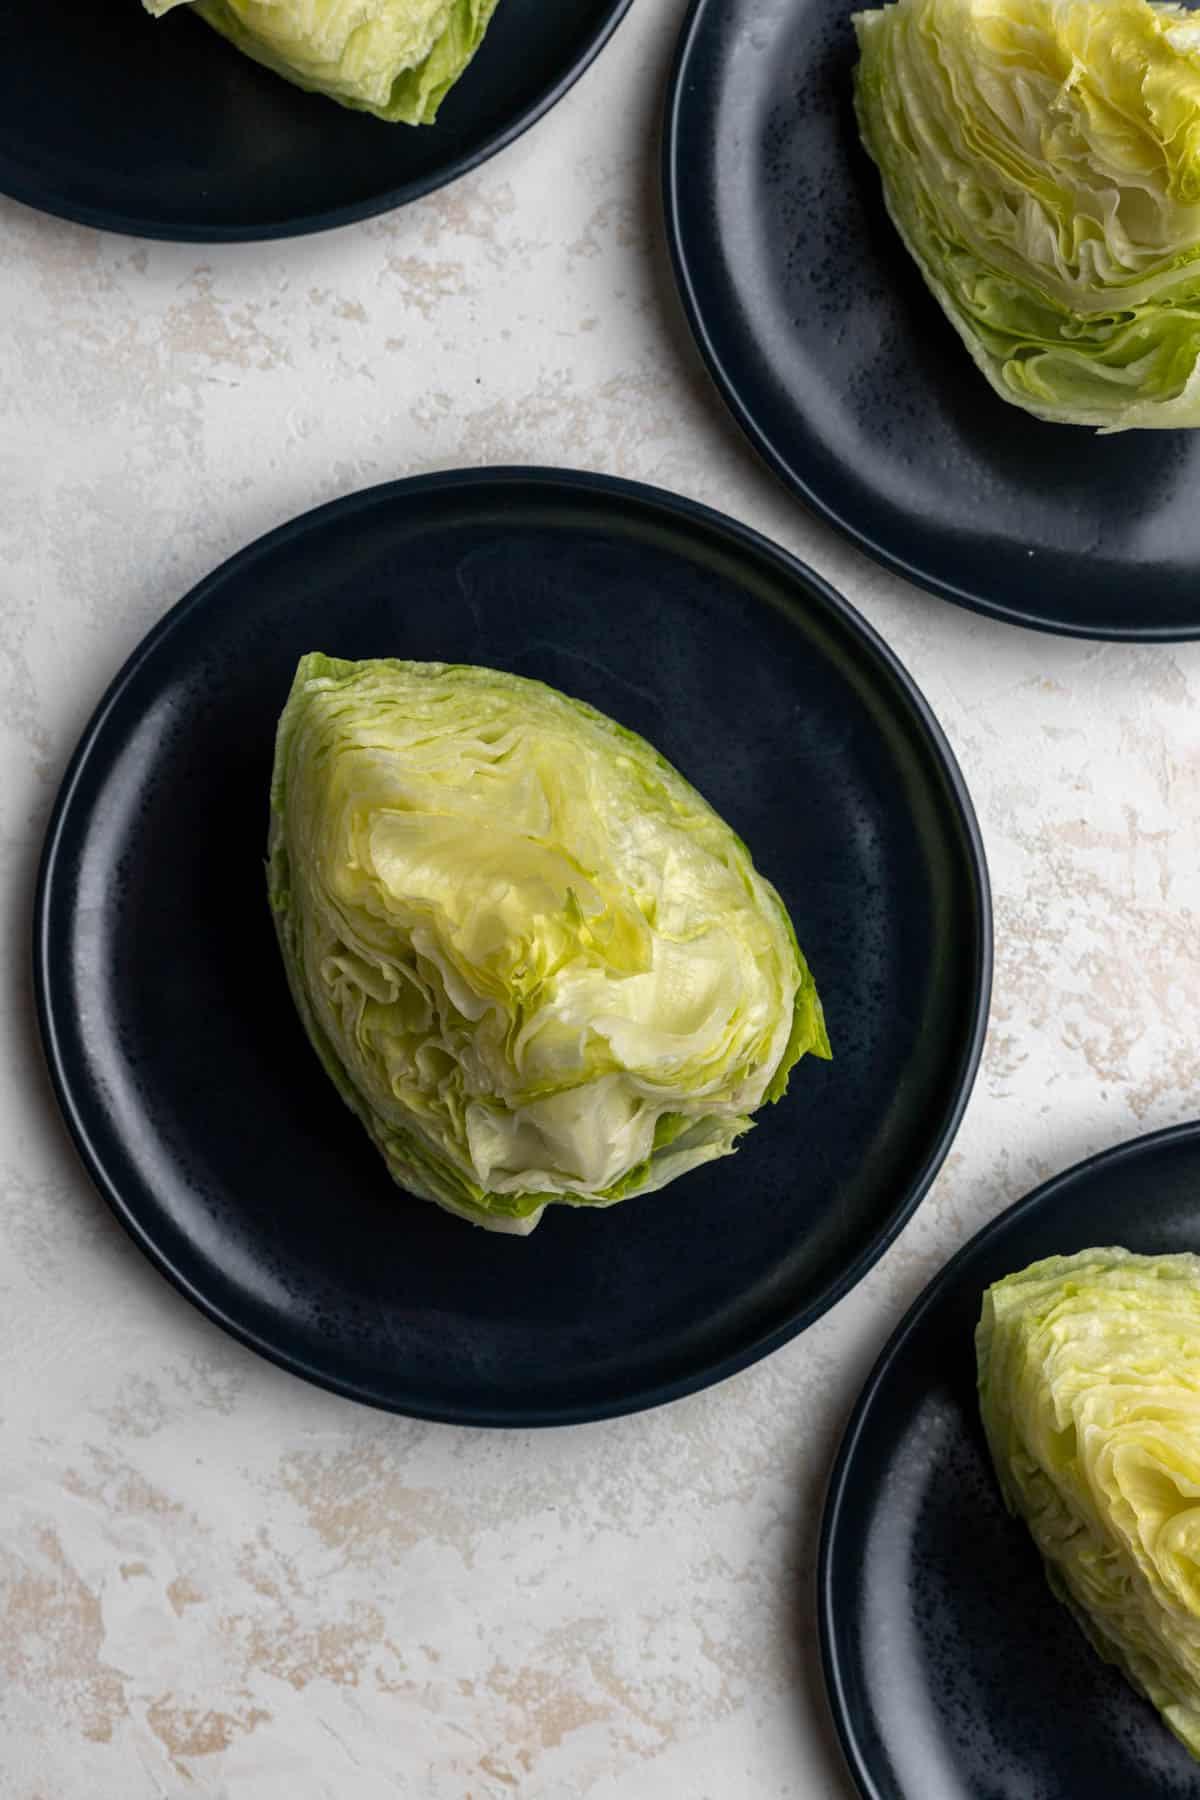 Wedges of iceberg lettuce on 4 blue plates.